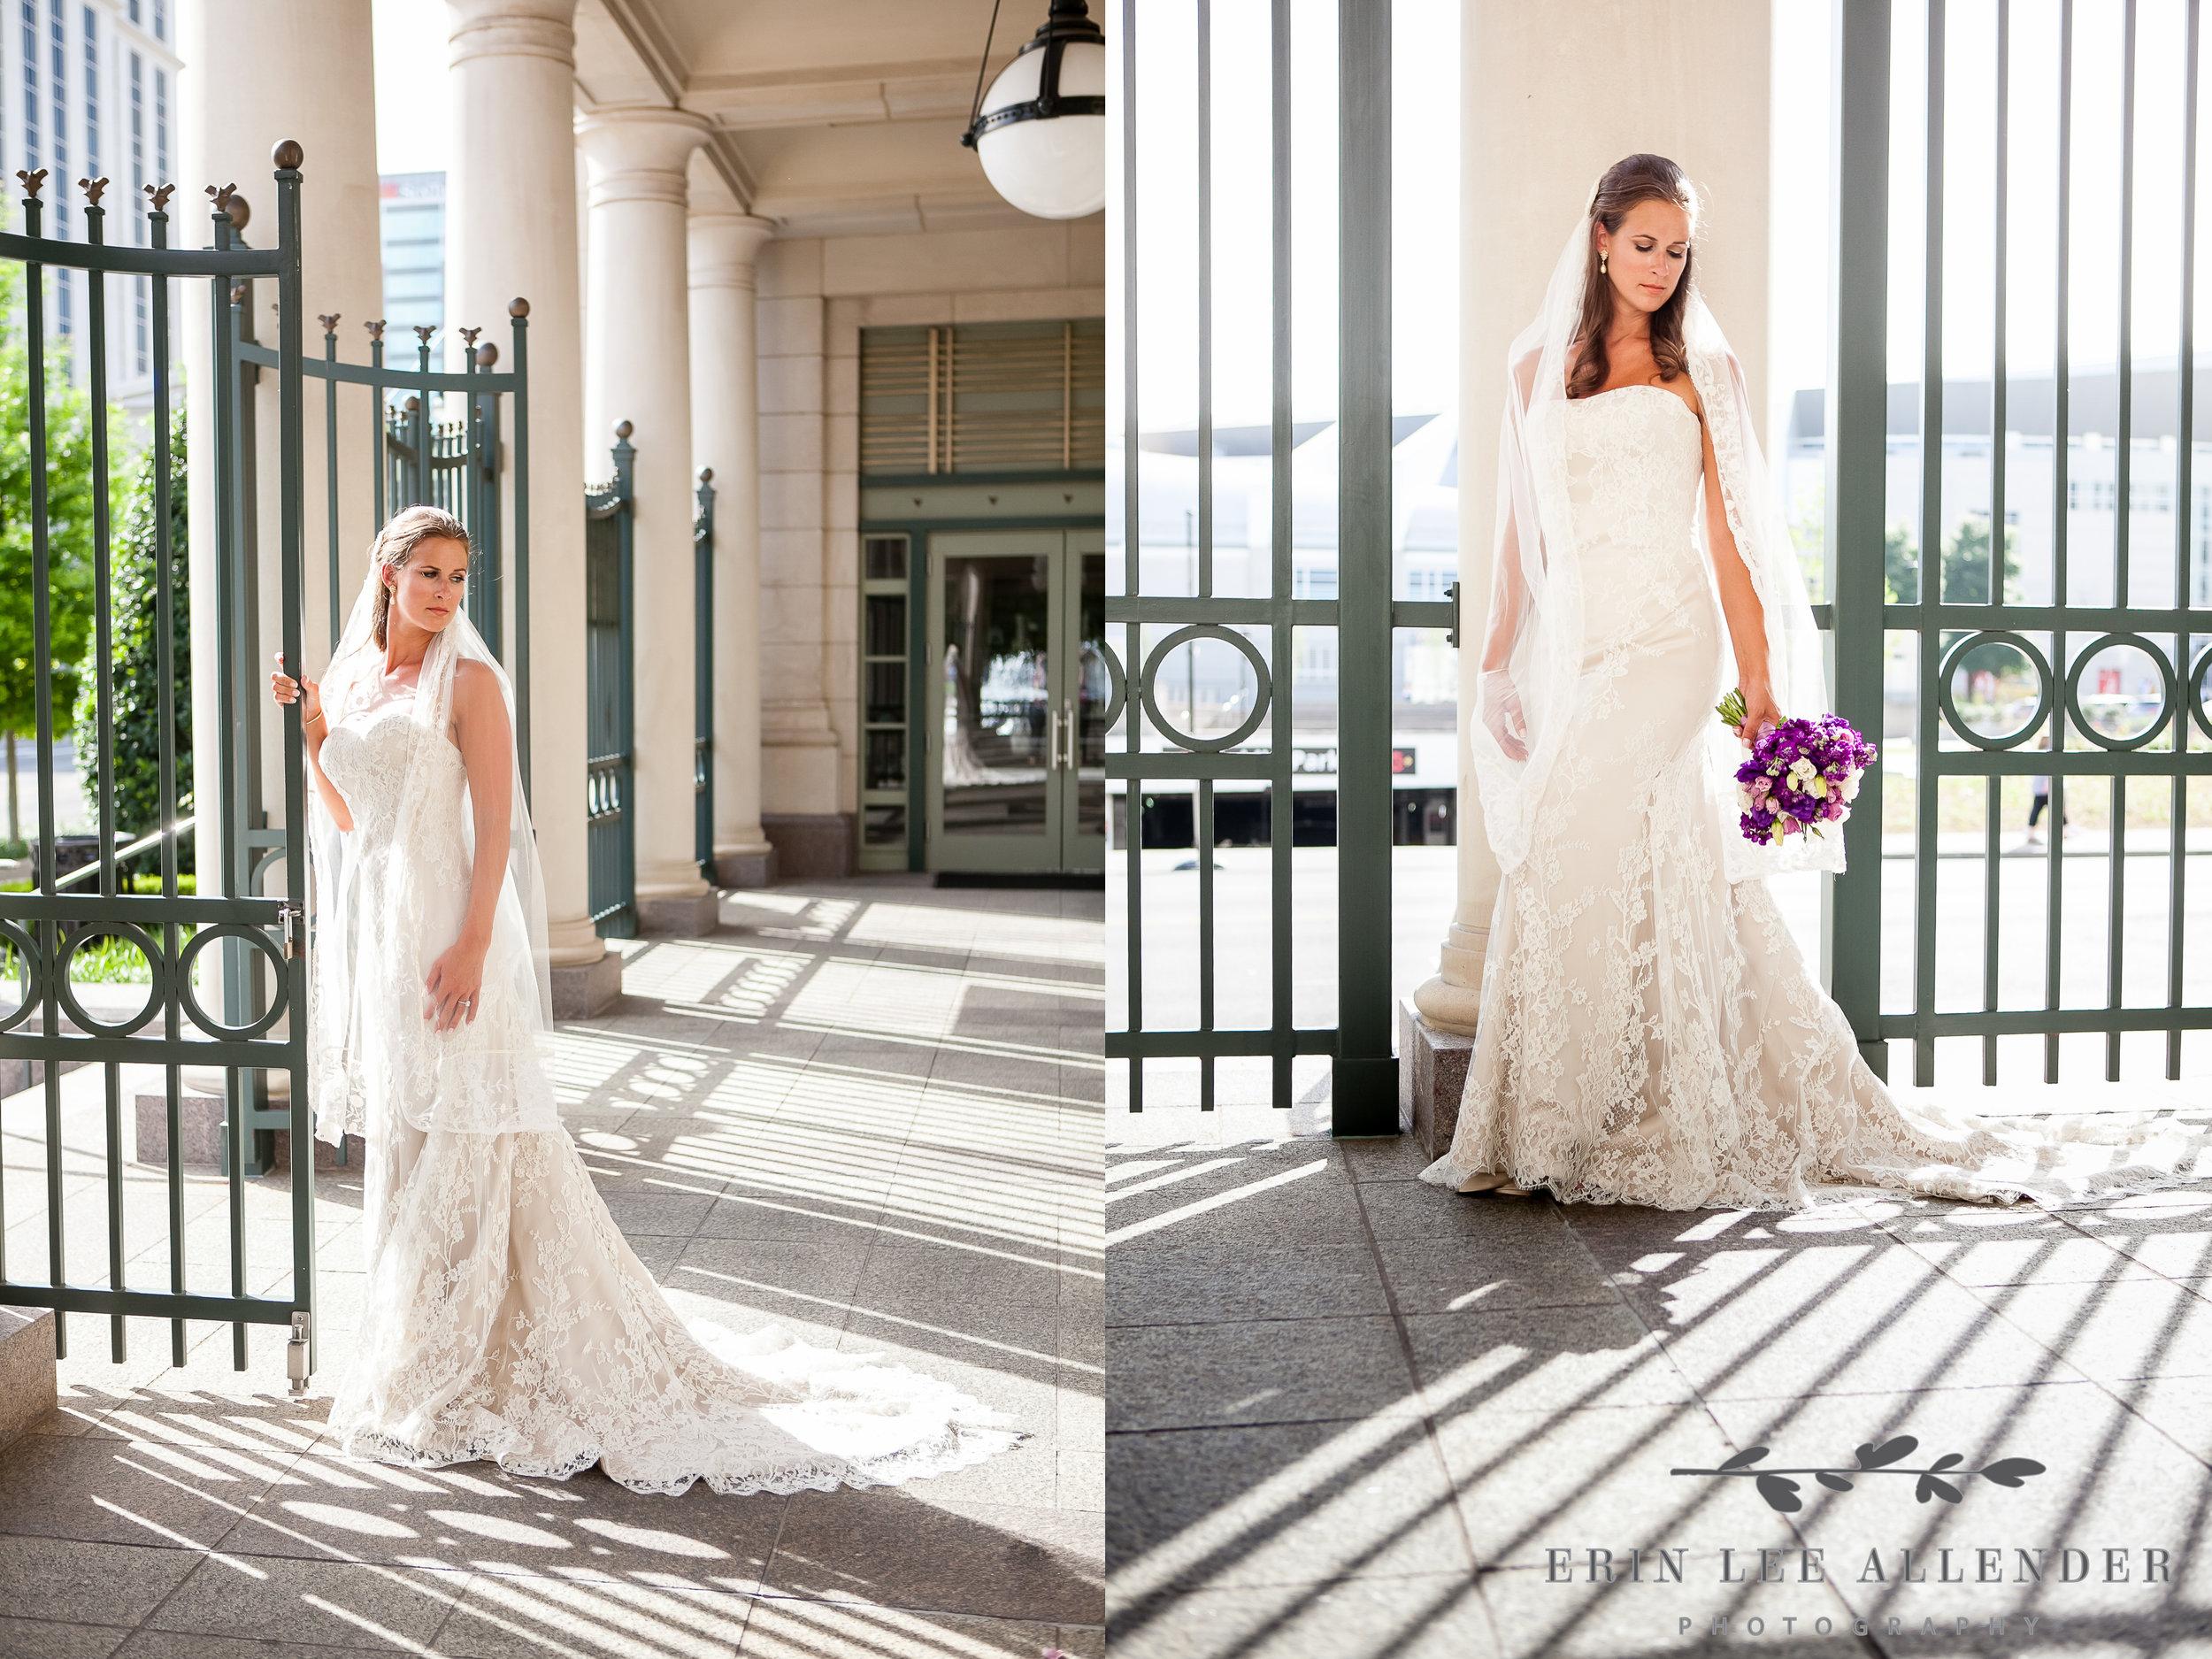 Bride_At_Gates